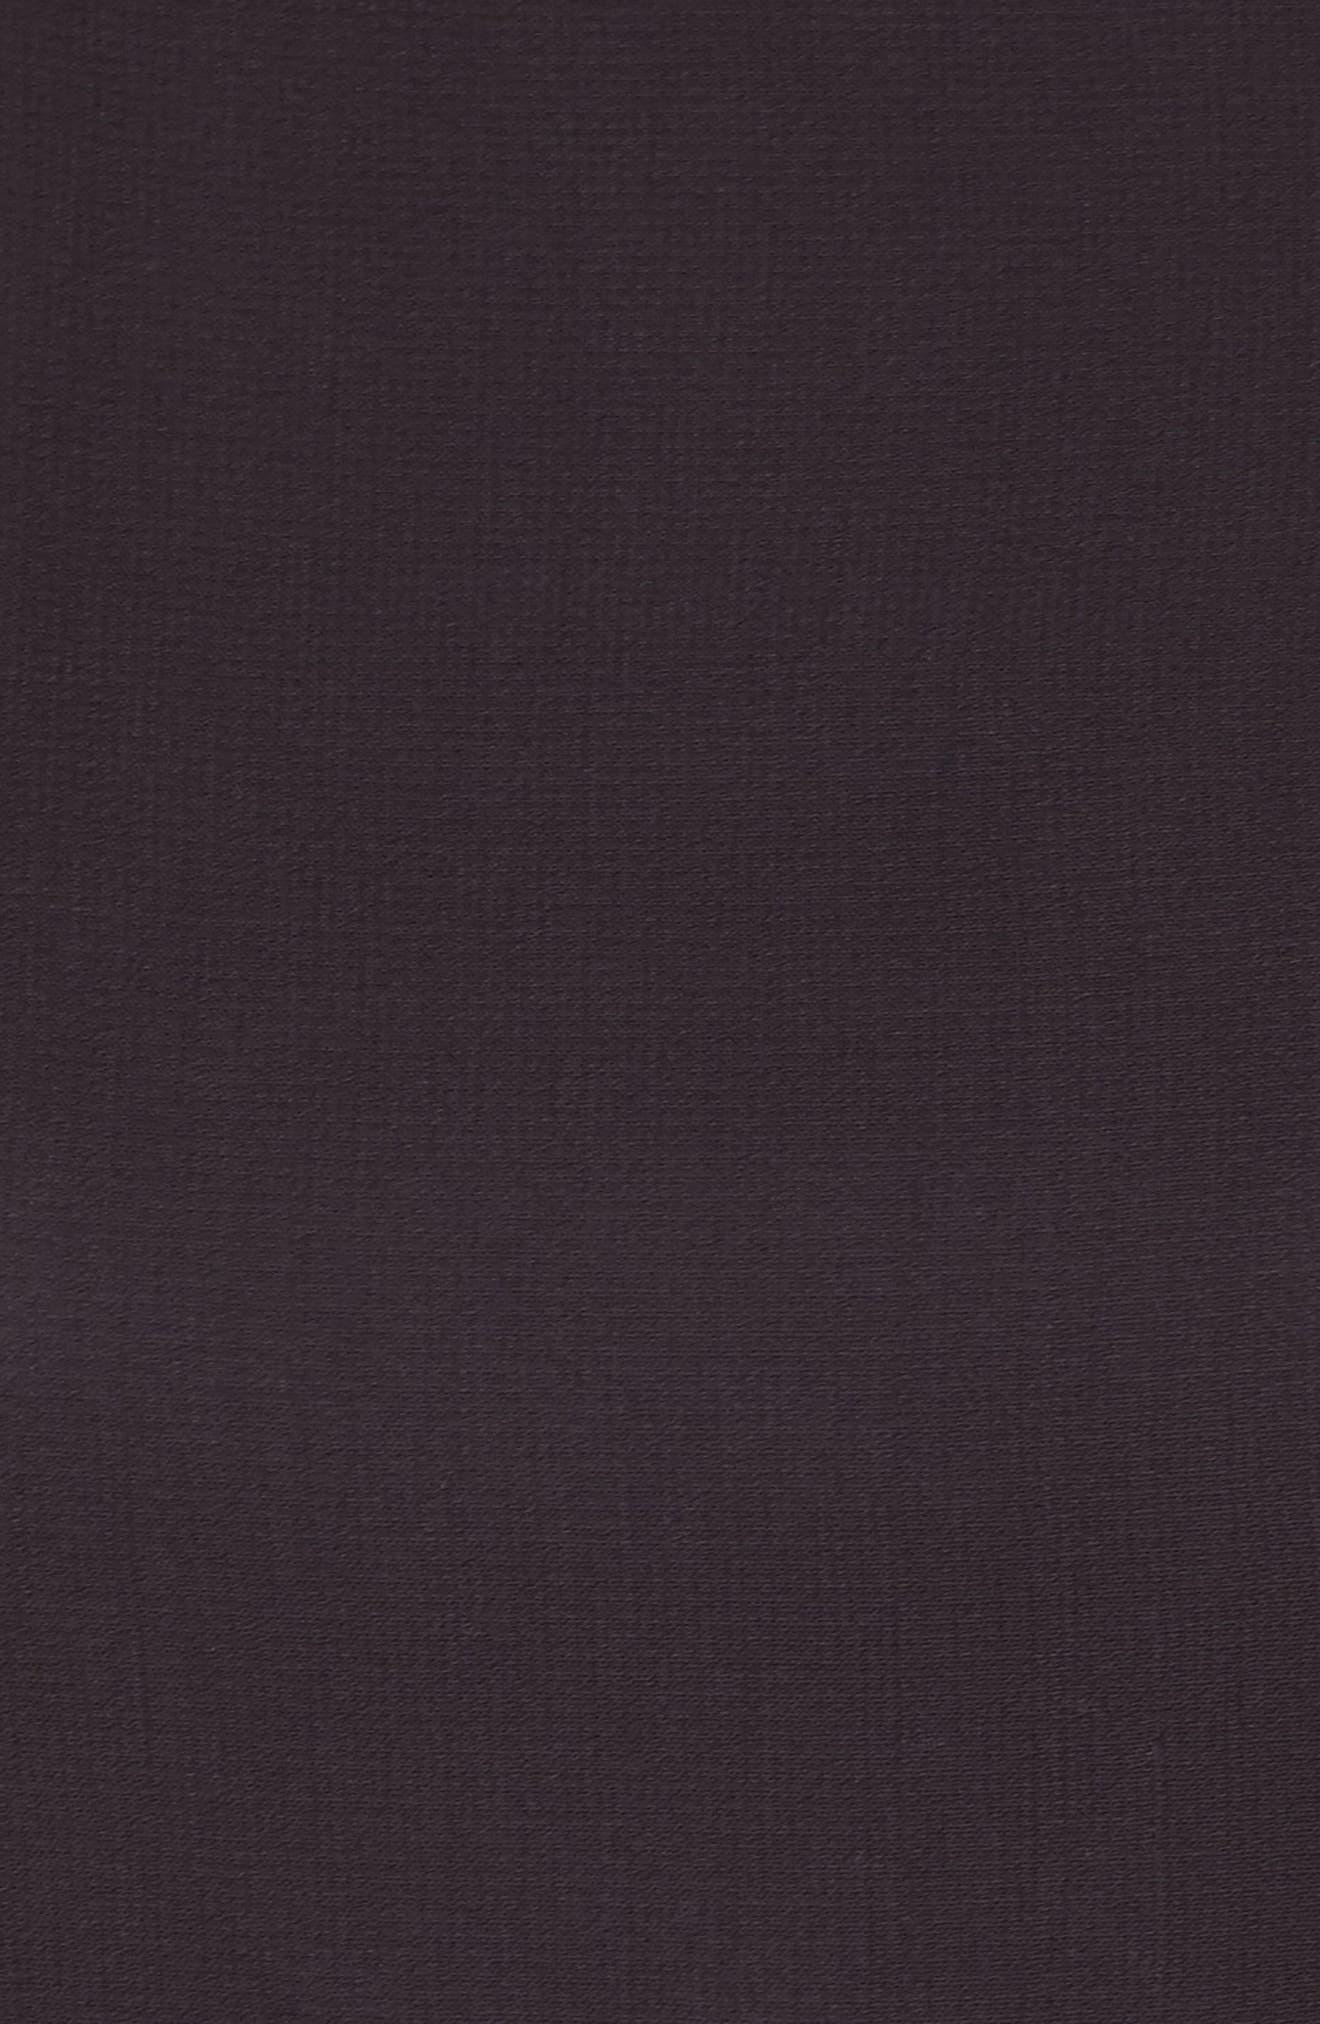 Lace & Chiffon Dress,                             Alternate thumbnail 5, color,                             001